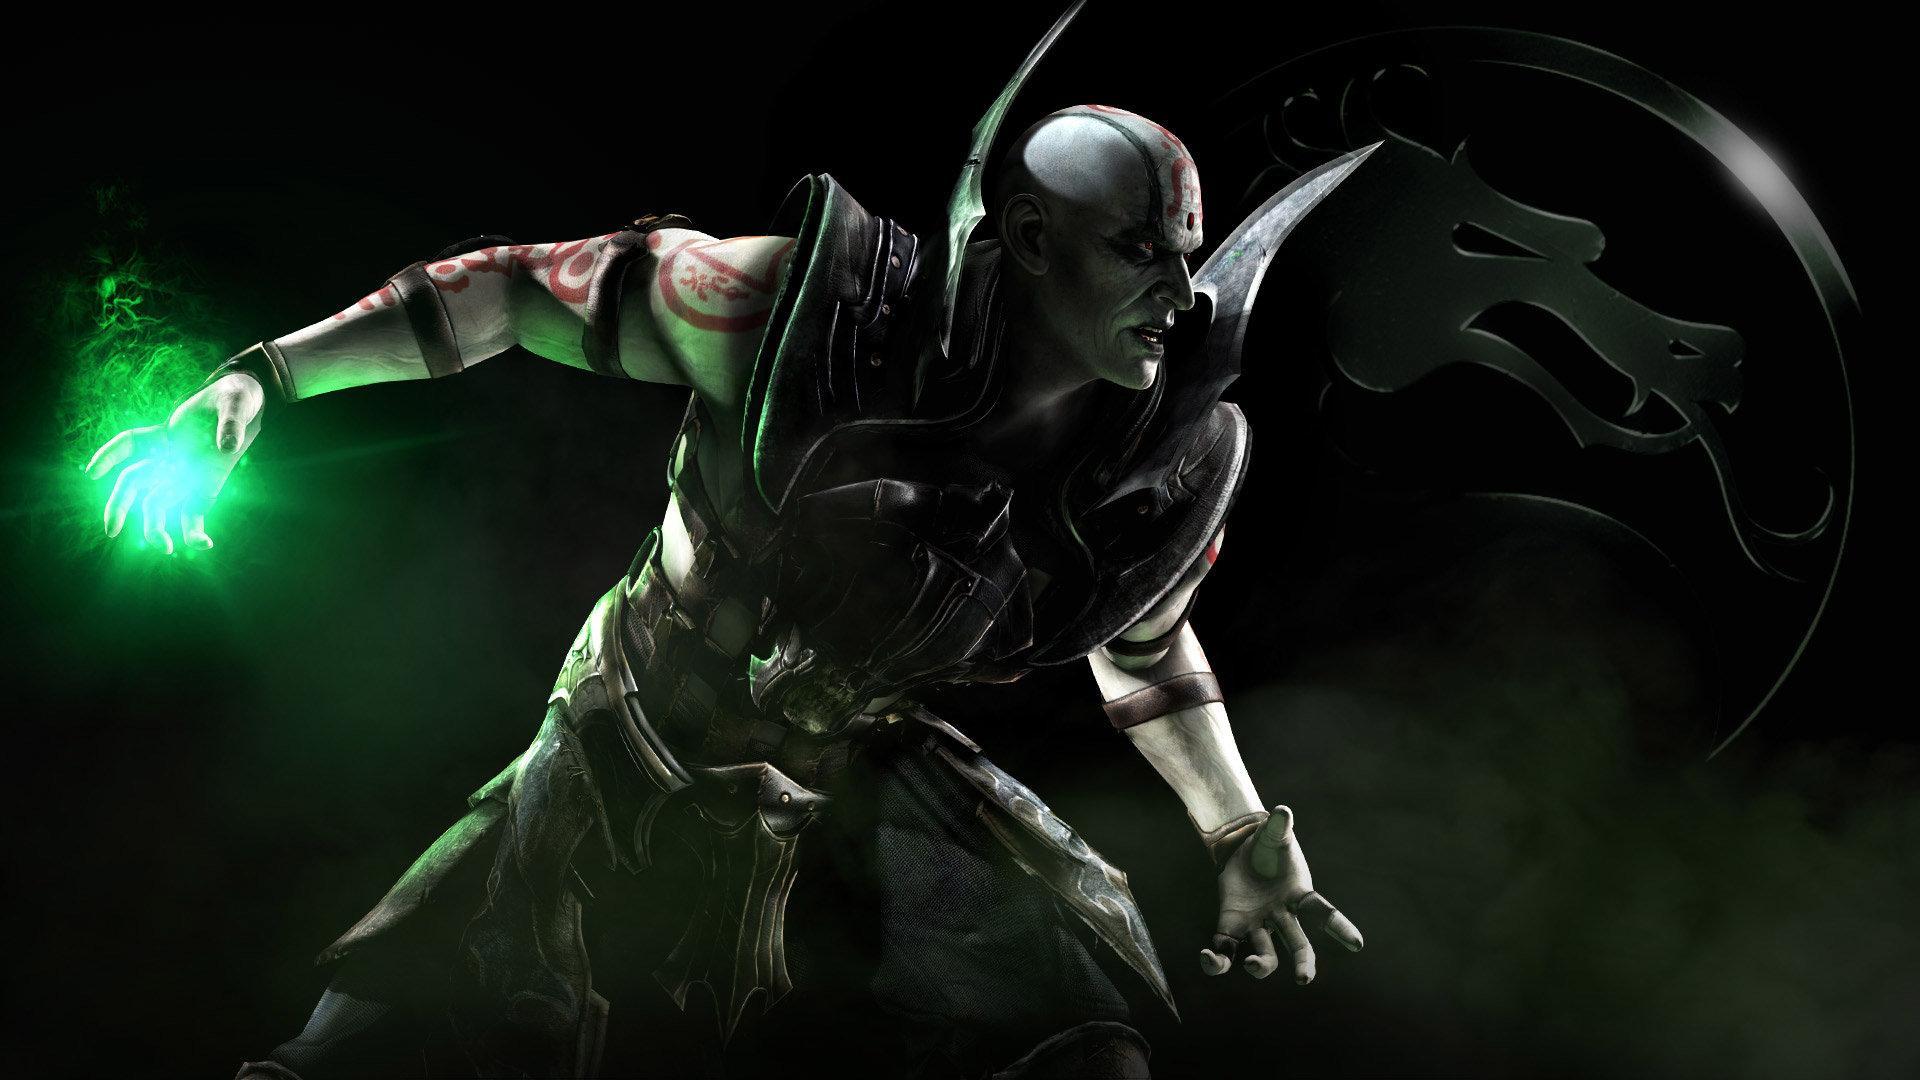 Free Mortal Kombat X High Quality Wallpaper Id436717 For